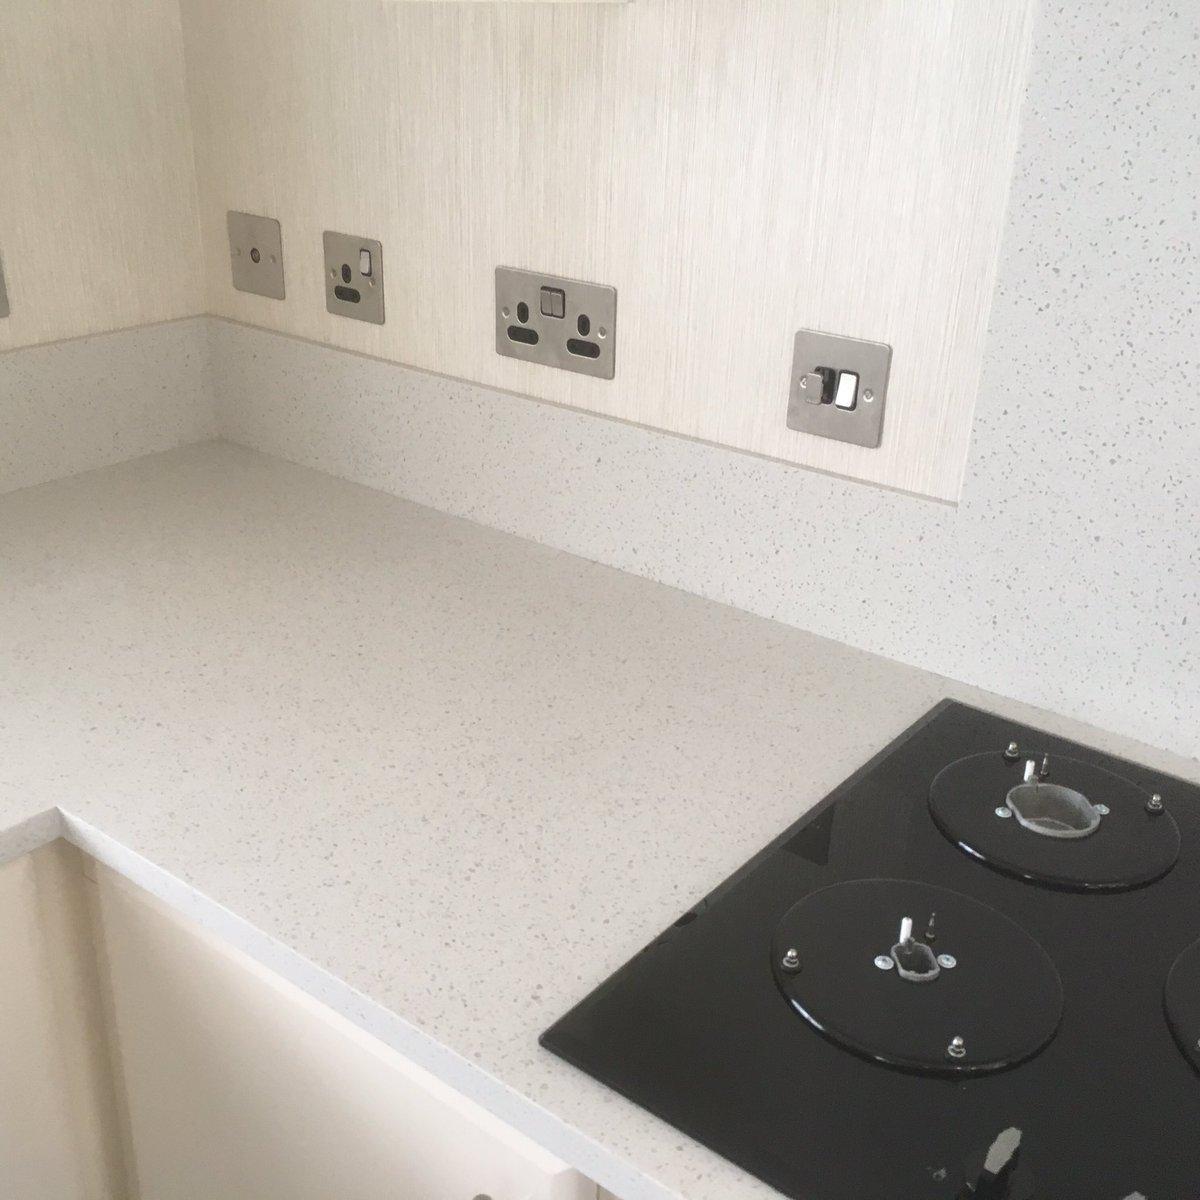 Minerva bathroom tops minerva - Brian Jackman On Twitter Minerva Grey Crystal Worktops Installed In A Luxury Holiday Home At Heathland Beach Park In Kessingland Today